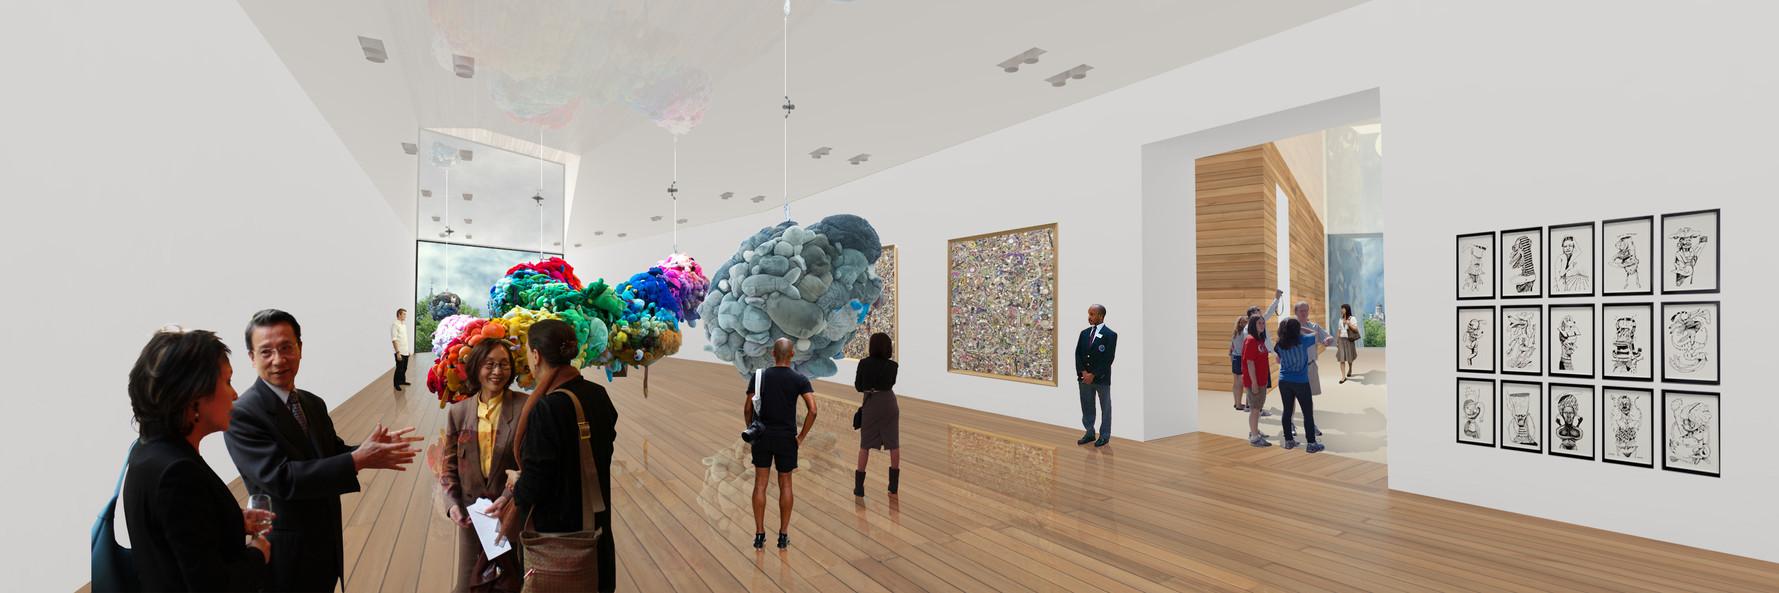 Guggenheim Interior 2 Render Final.jpg